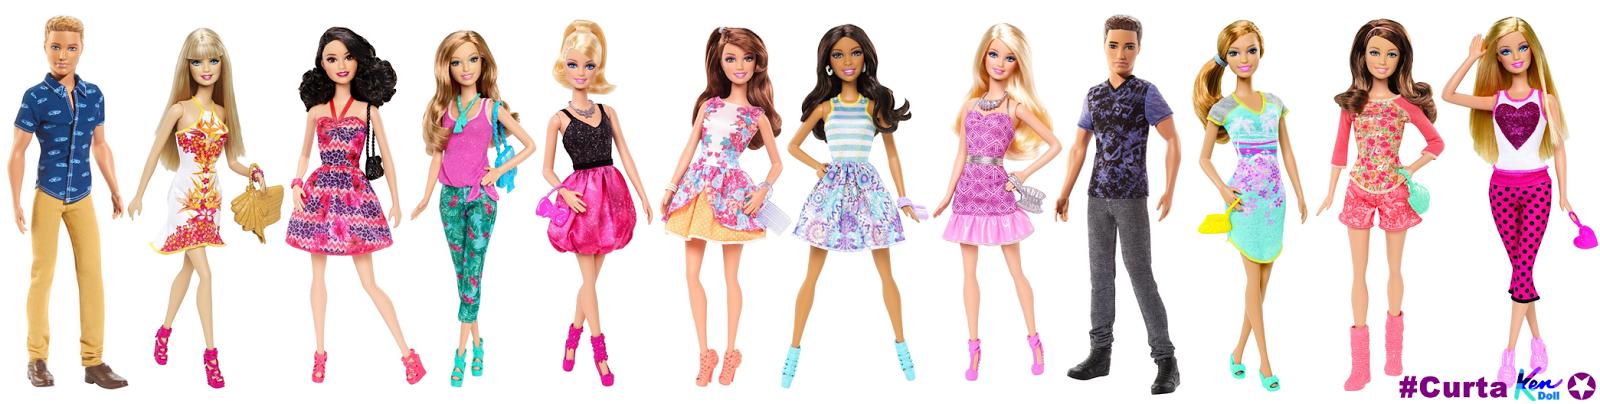 Barbie Fashionistas Swappin Styles 2014 Autos Post